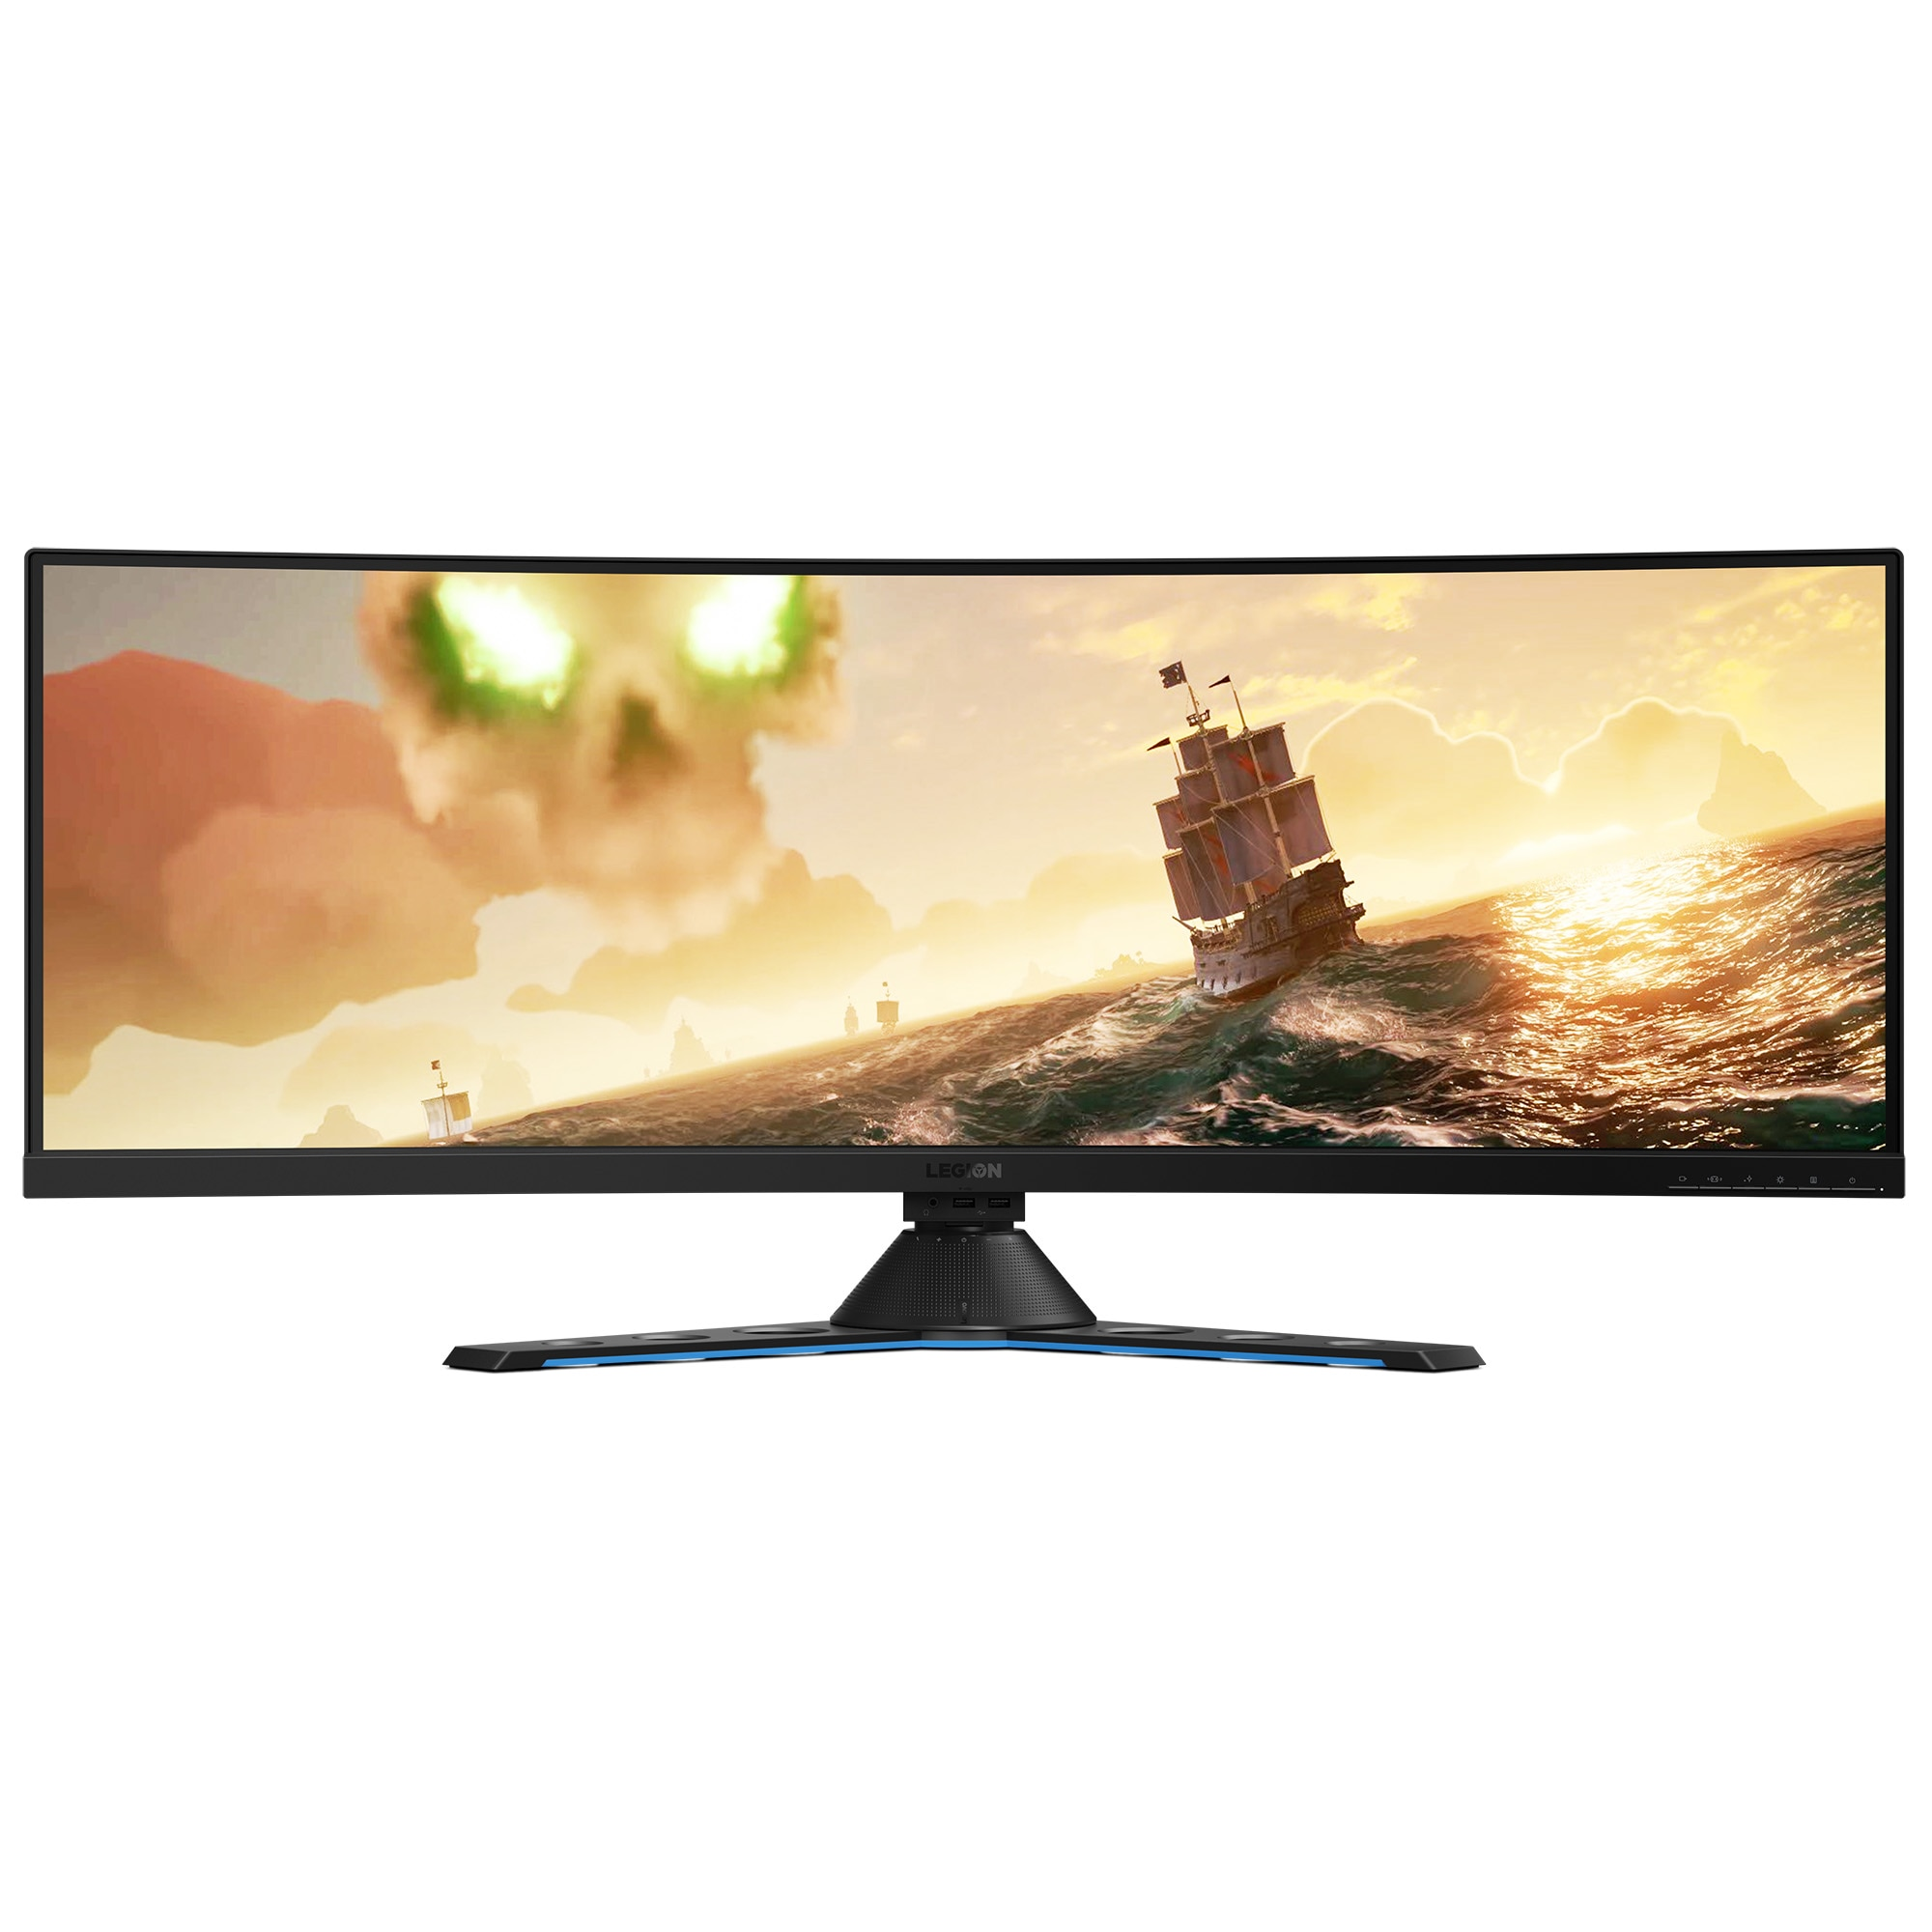 "Fotografie Monitor Gaming LED VA Lenovo Legion 43.4"", Ultra wide 32:10, 144 Hz , FreeSync2, Display Port, Soundbar Harman Kardon, USB 3.1 Type-C, Negru, Y44w-10"